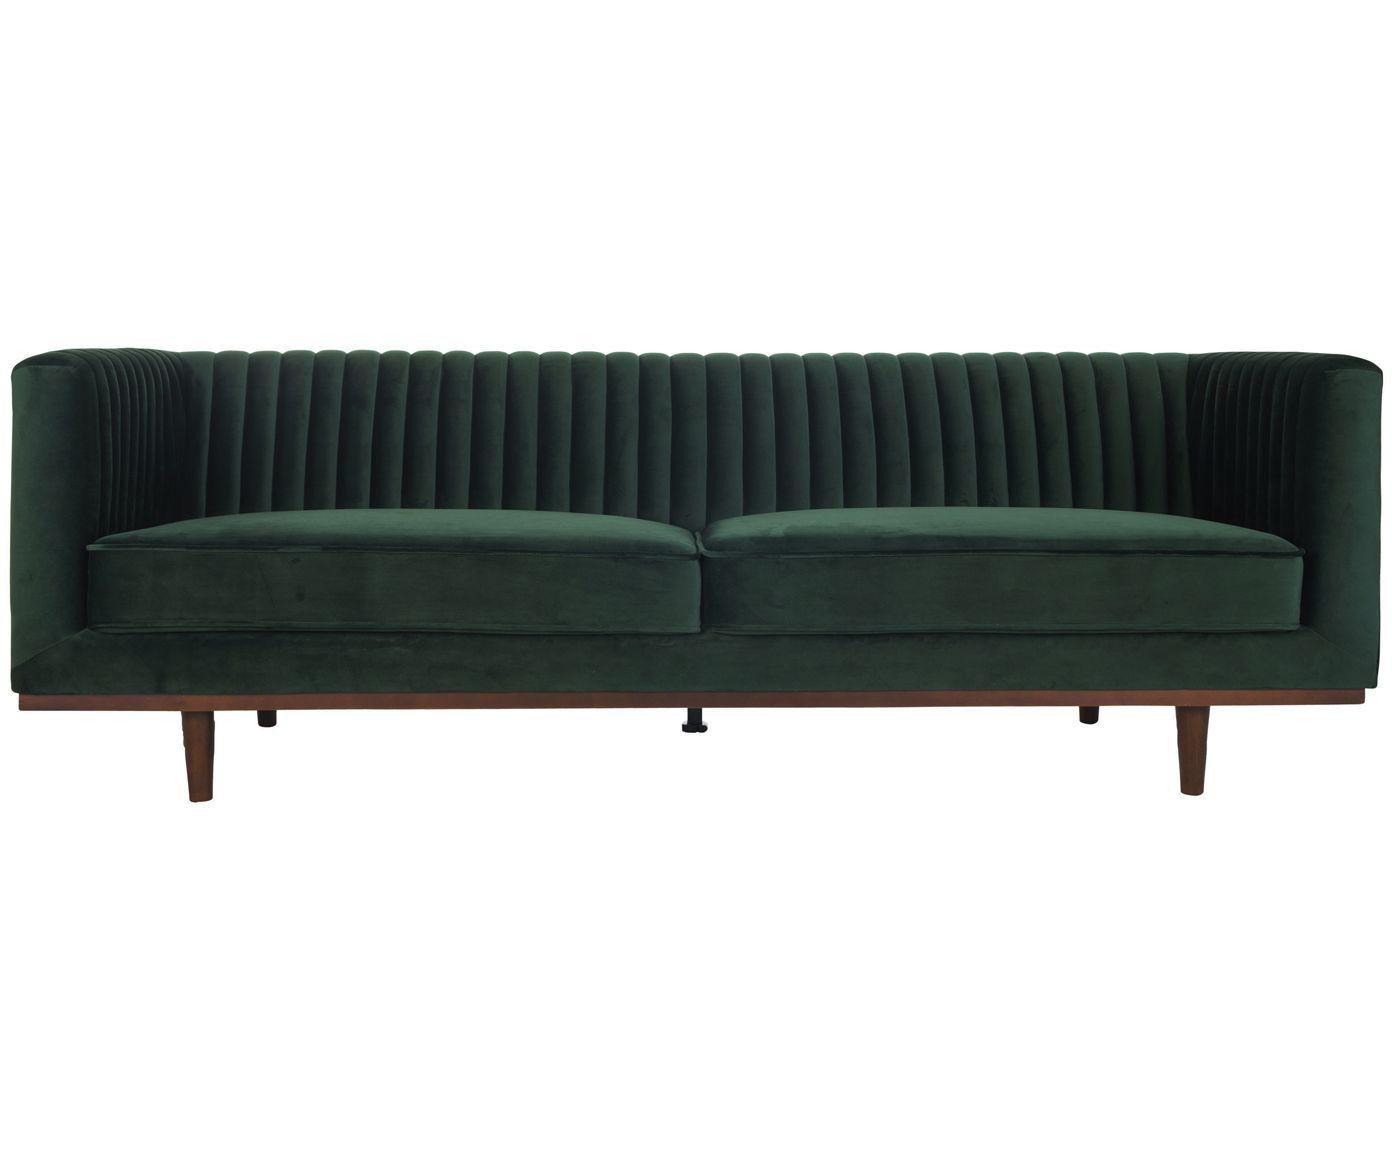 Fluwelen Bank Dante 3 Zits Westwingnow Samt Sofa Sofa Wohnzimmer